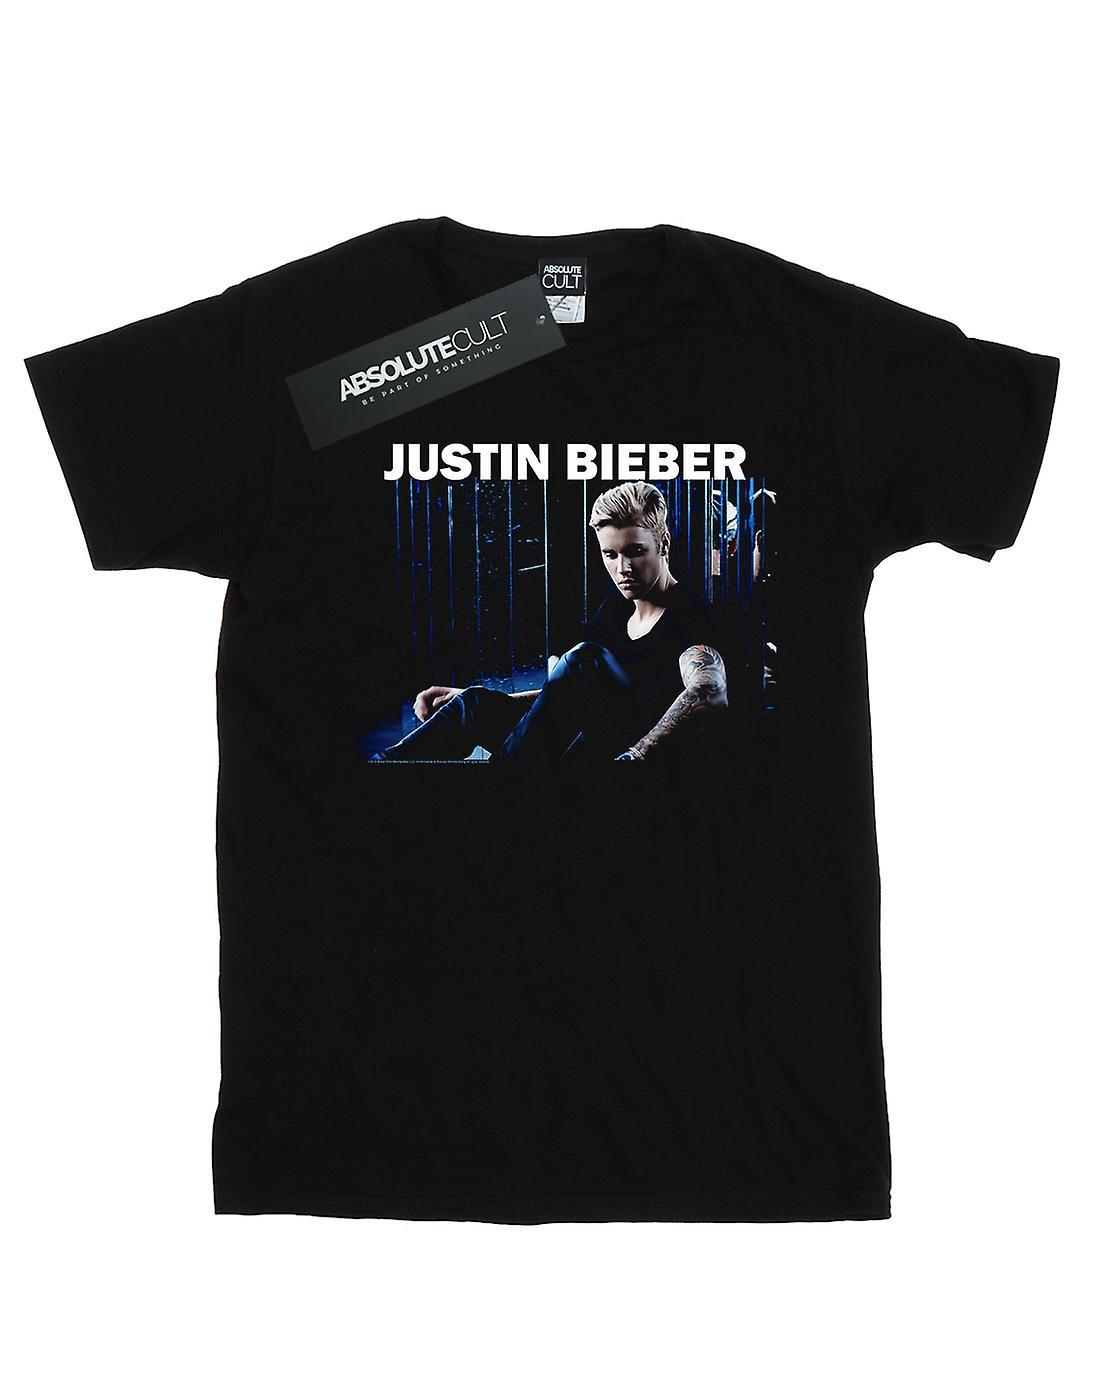 Justin Bieber Girls Sitting Shadows T-Shirt